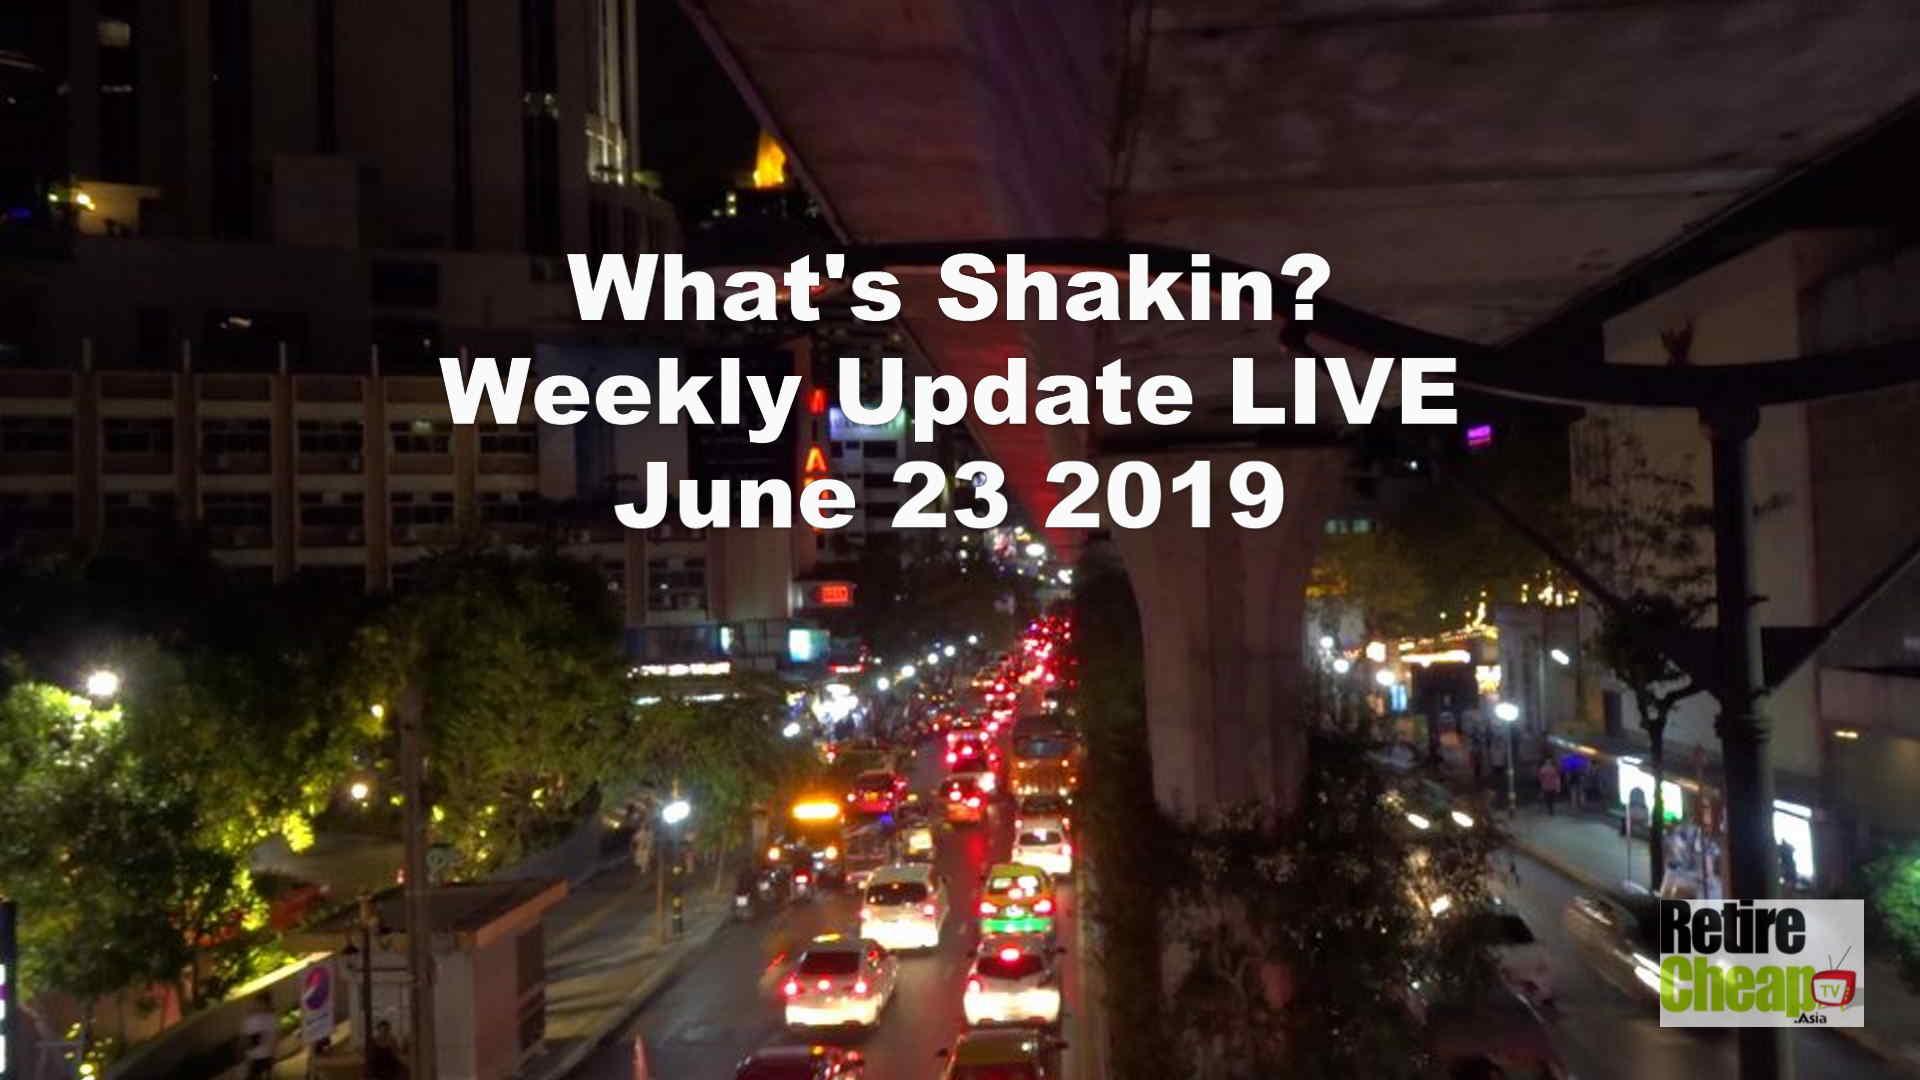 What's Shakn'? Week June 23 2019